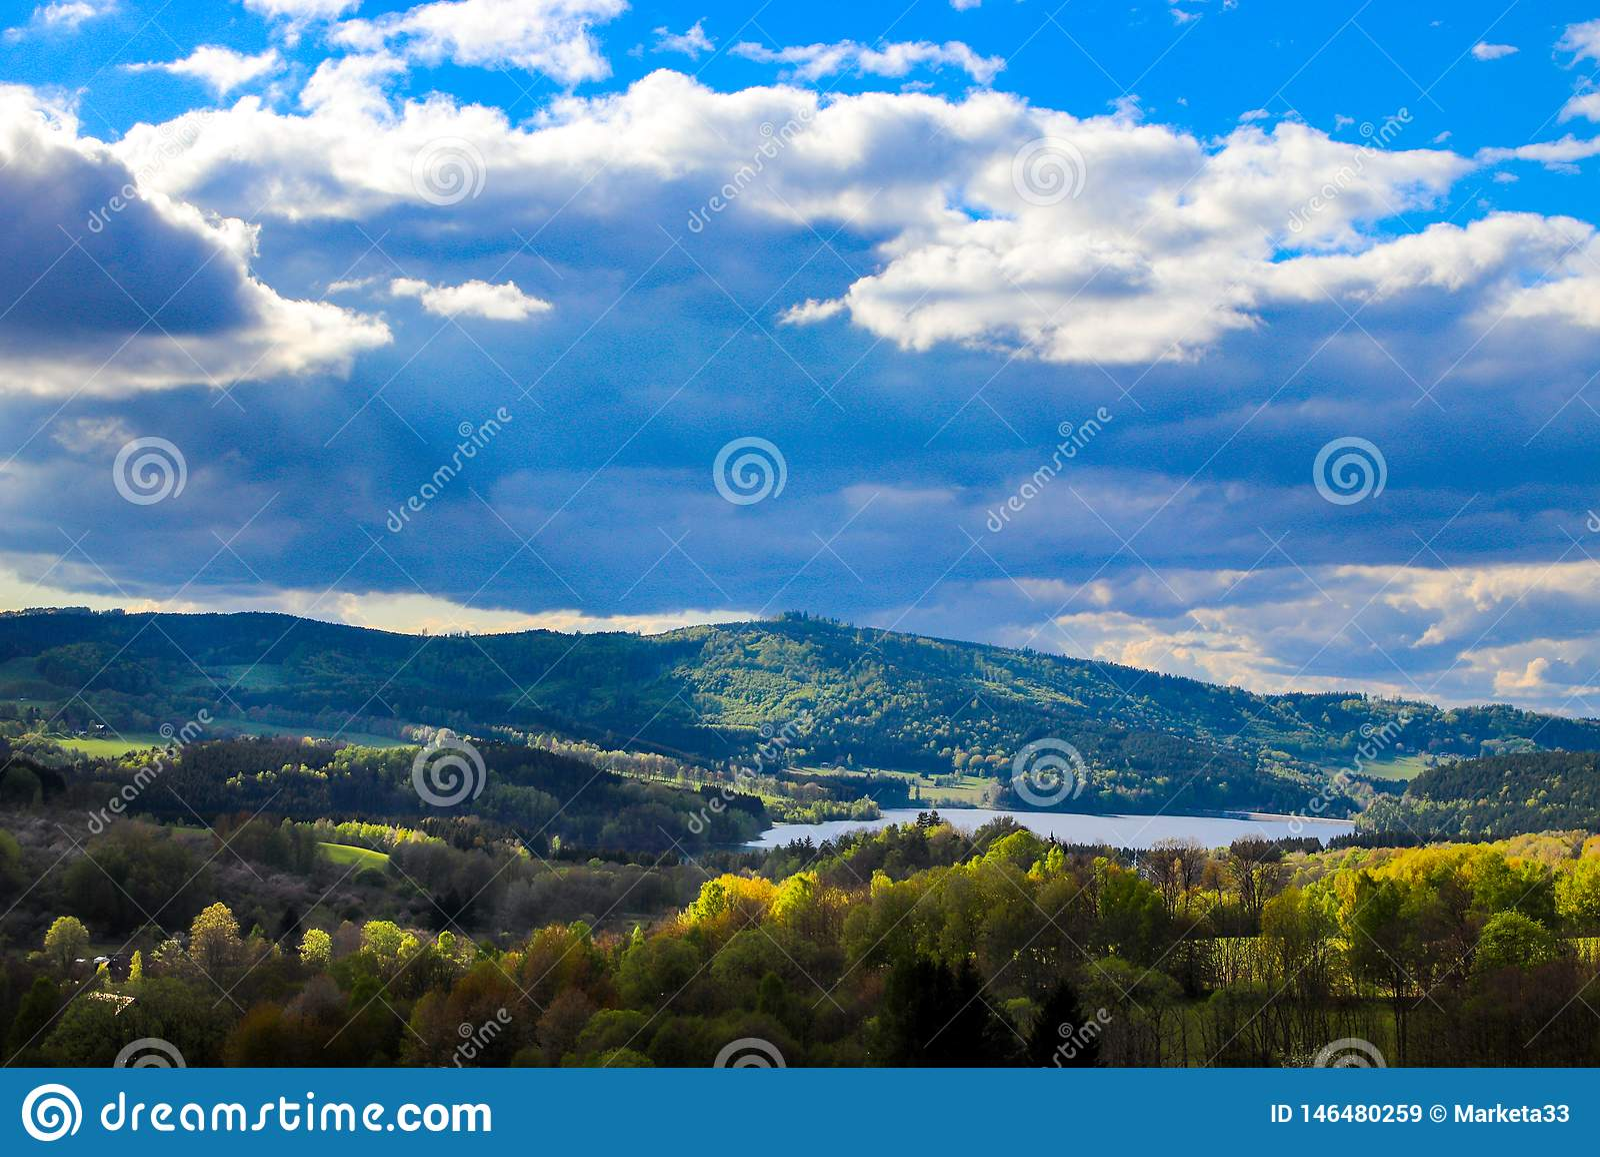 Mismo hermosa vista del paisaje checo